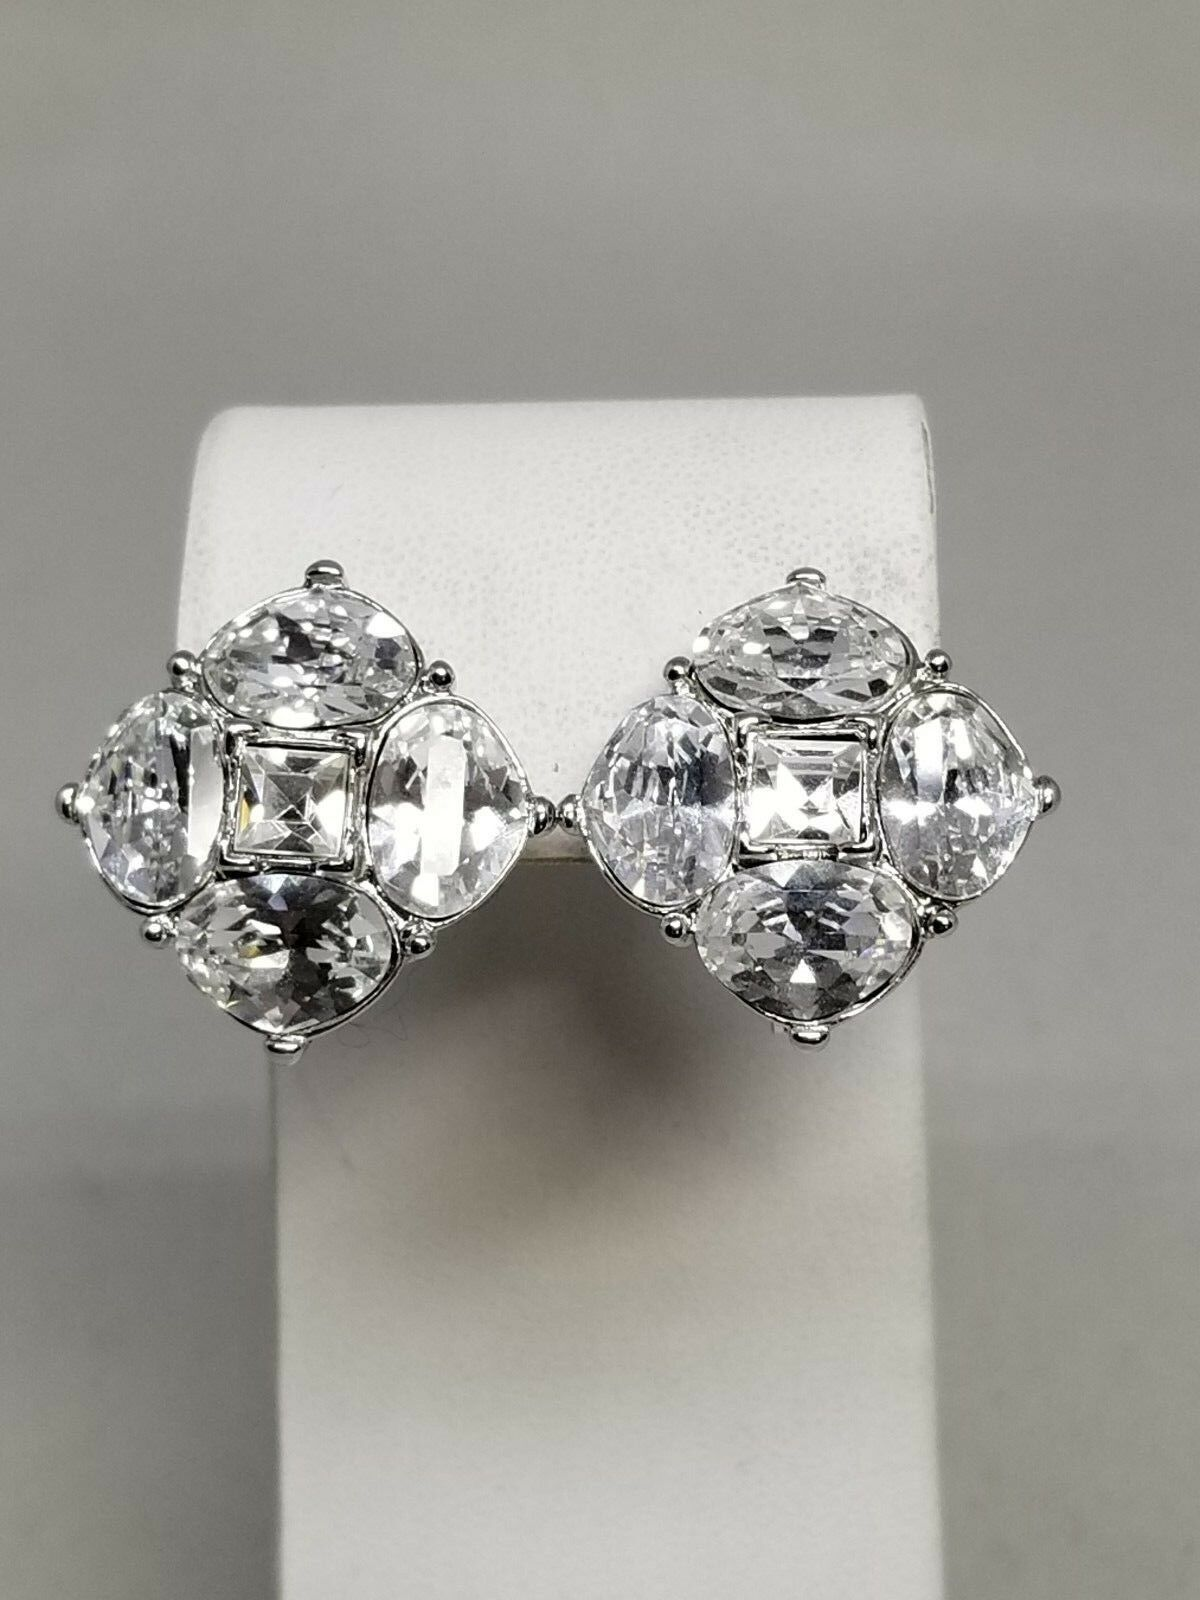 Elegant Monet Unique Rhinestone Square Shaped Earrings